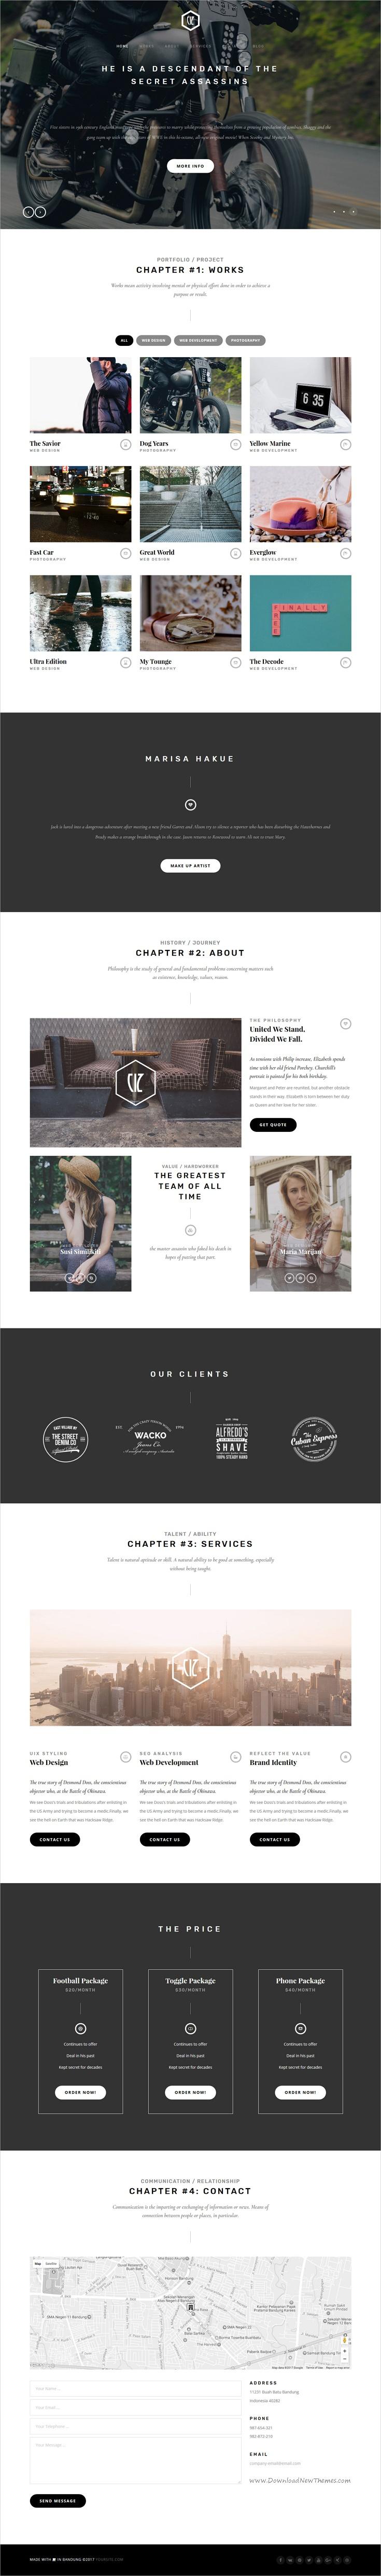 Cizarua - Responsive One Page Portfolio Template